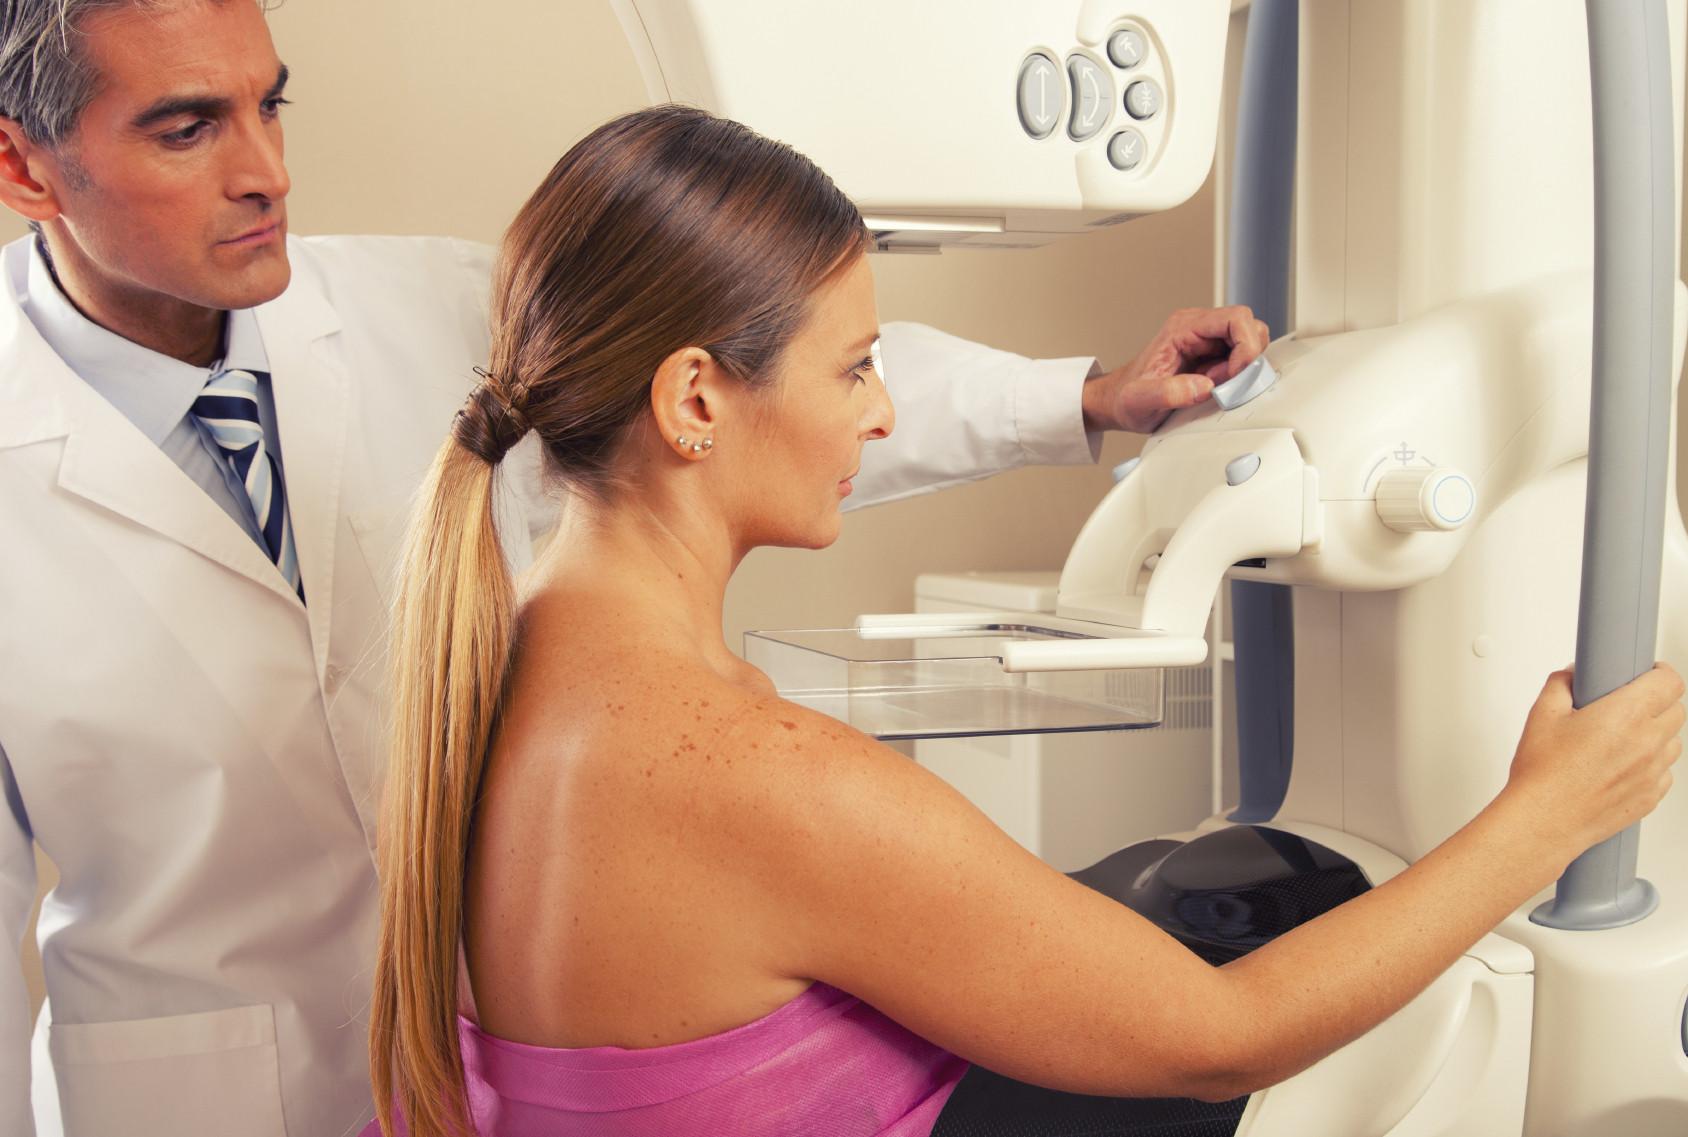 mammogram-breast-canceriStock_000045738620_Medium1